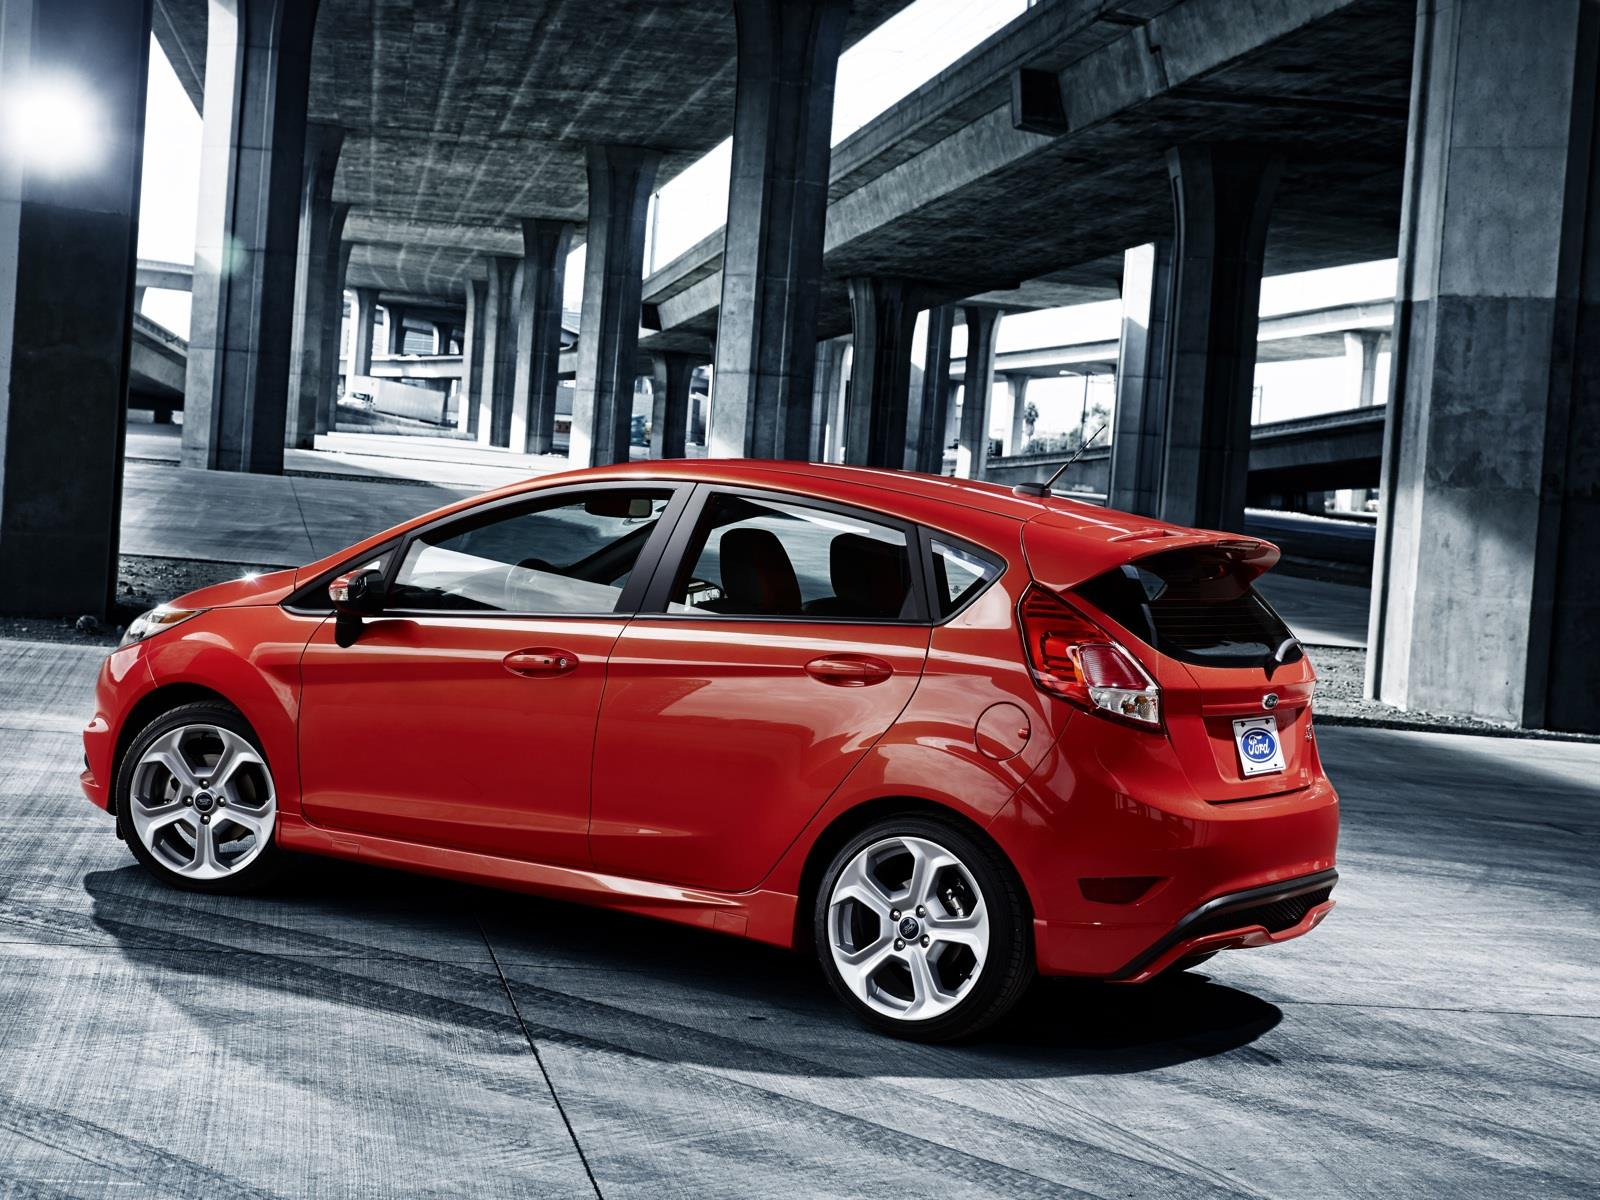 Carros Ford Fiesta 2015 Galería Ford Fiesta st 2015